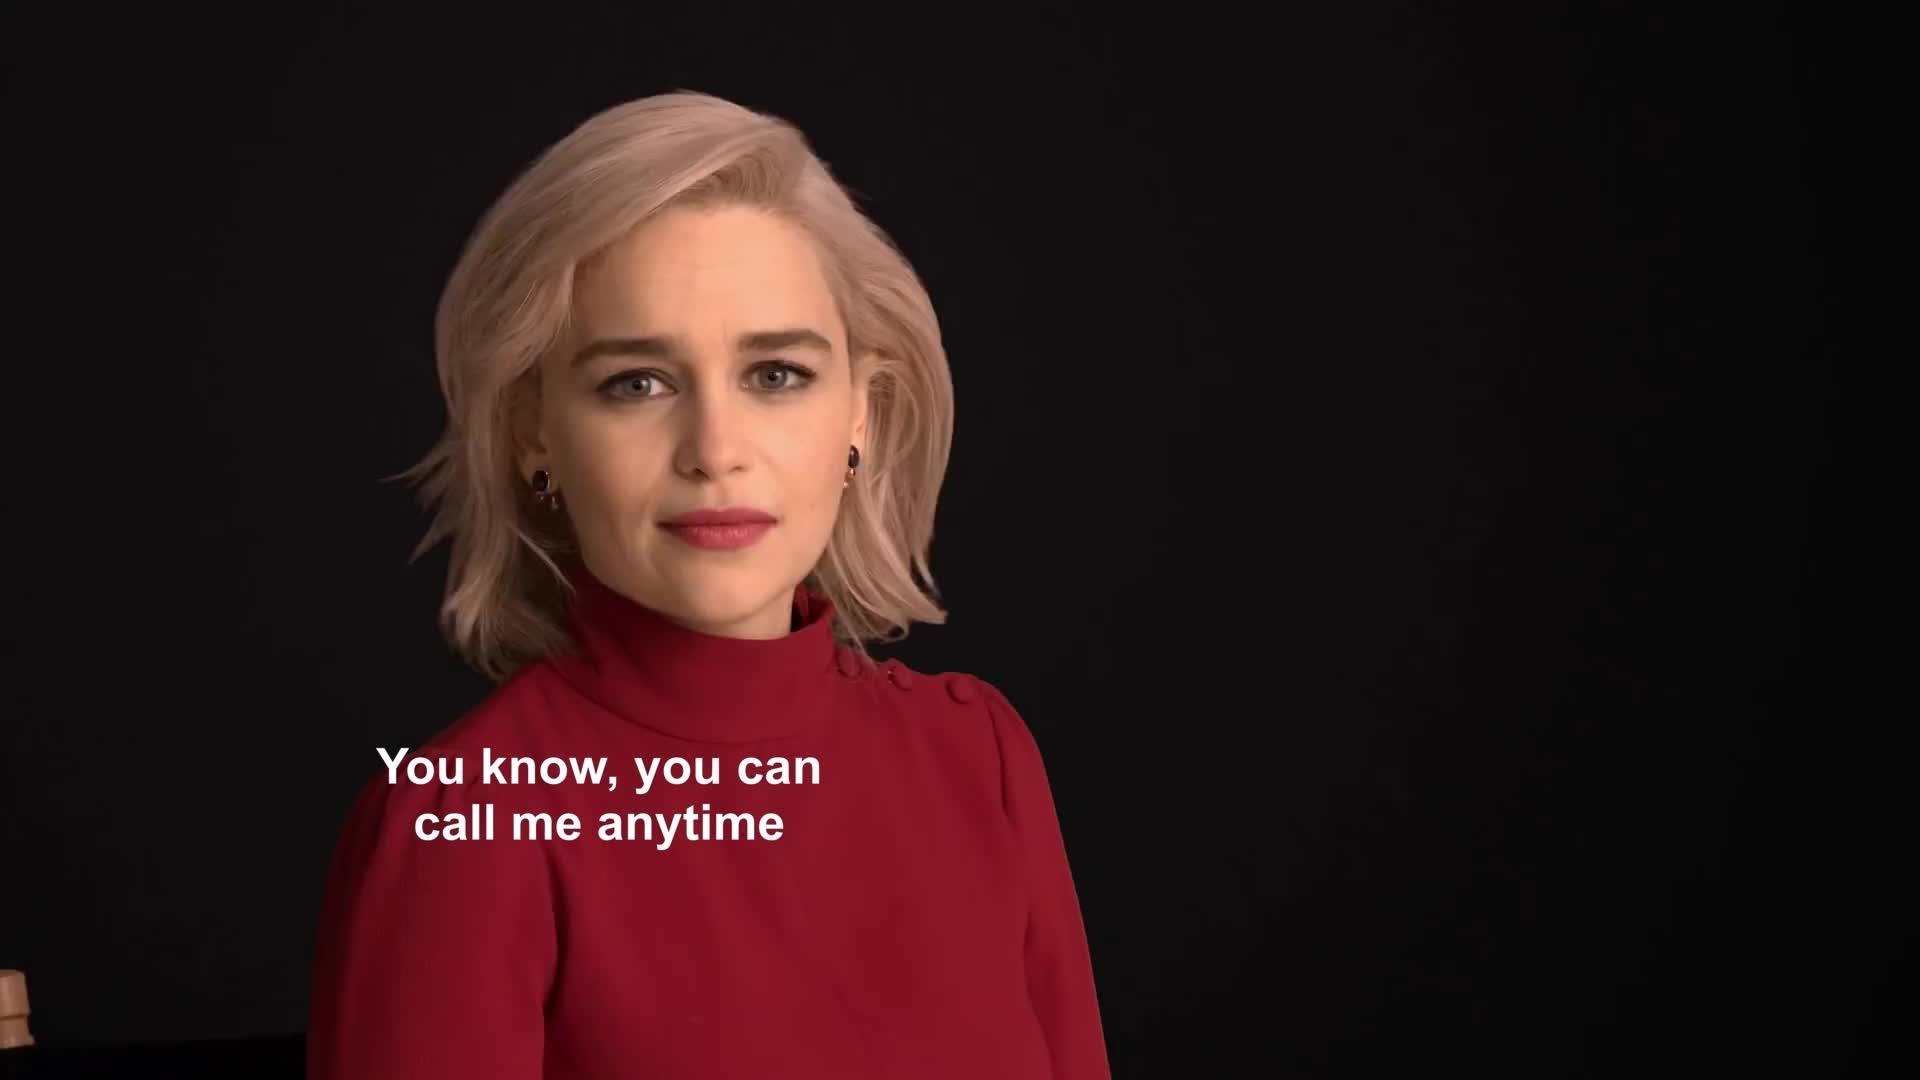 celebs, emilia clarke, qi'ra, Emilia Clarke GIFs